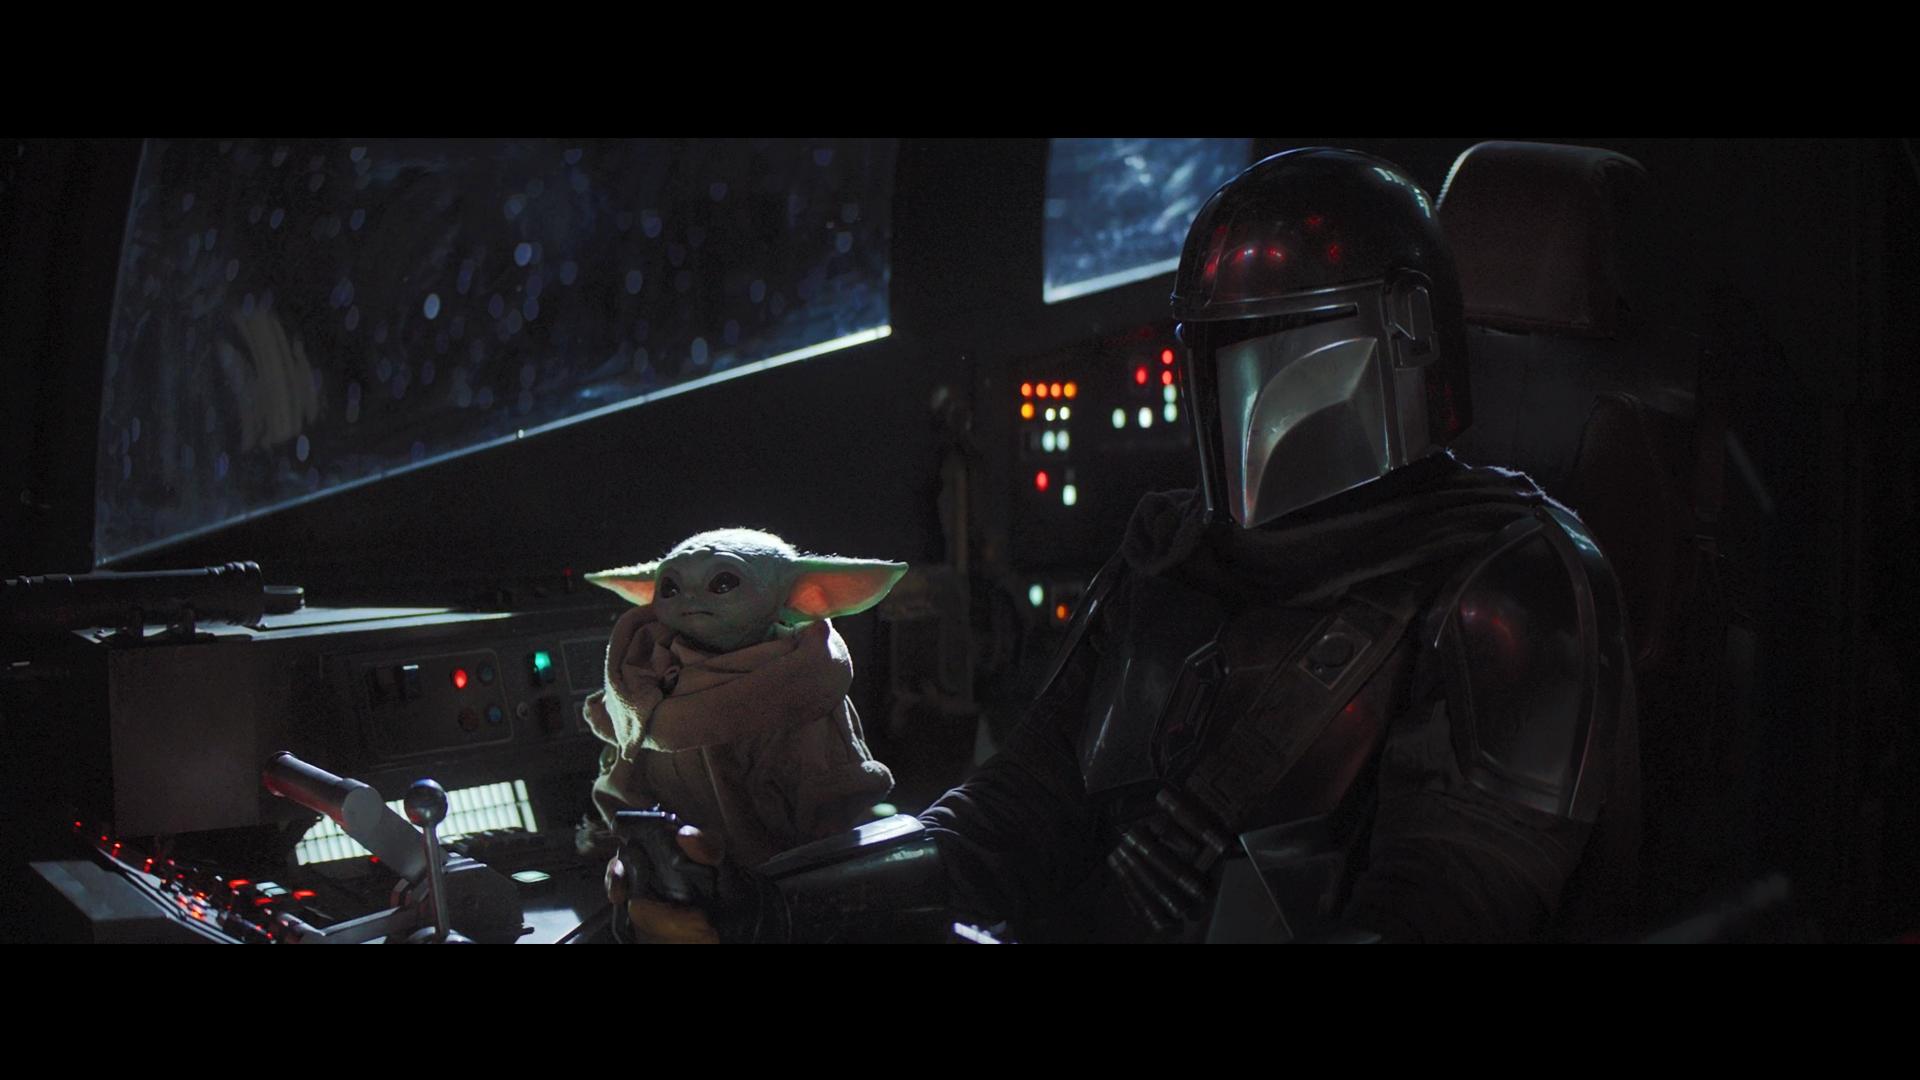 The Mandalorian Star Wars Yoda Baby Yoda tv series movie scenes space science fiction 1720851